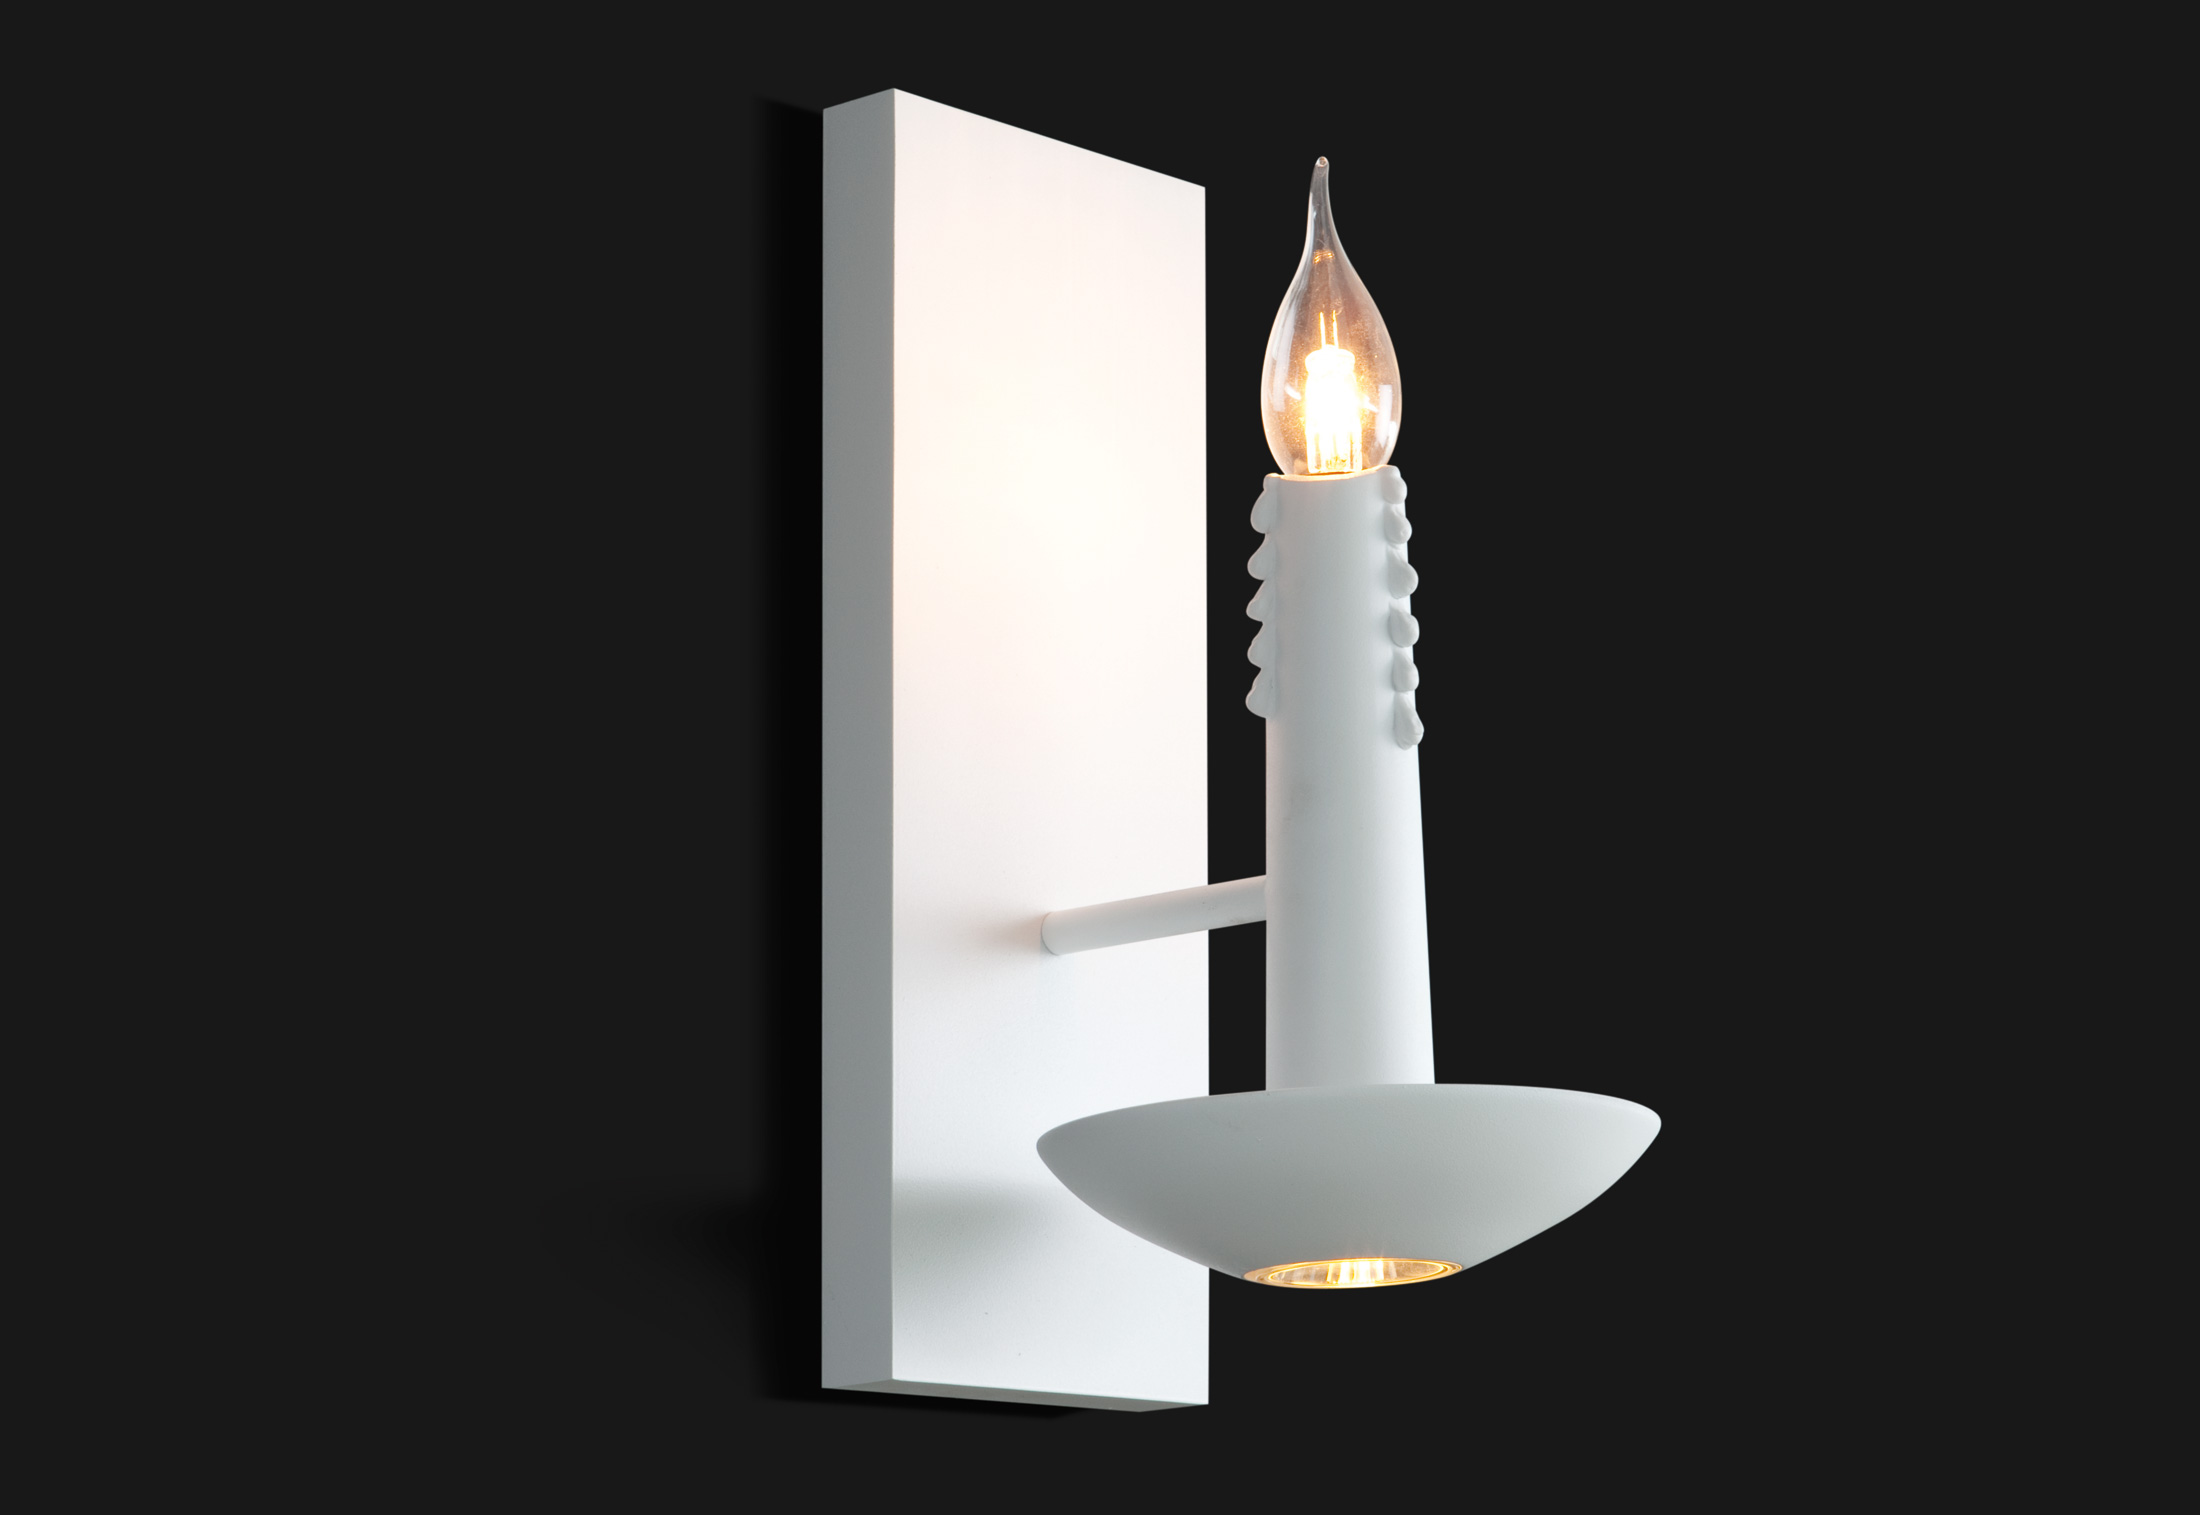 Floating Candles Brand Van Egmond.Floating Candles Wall Lamp By Brand Van Egmond Stylepark